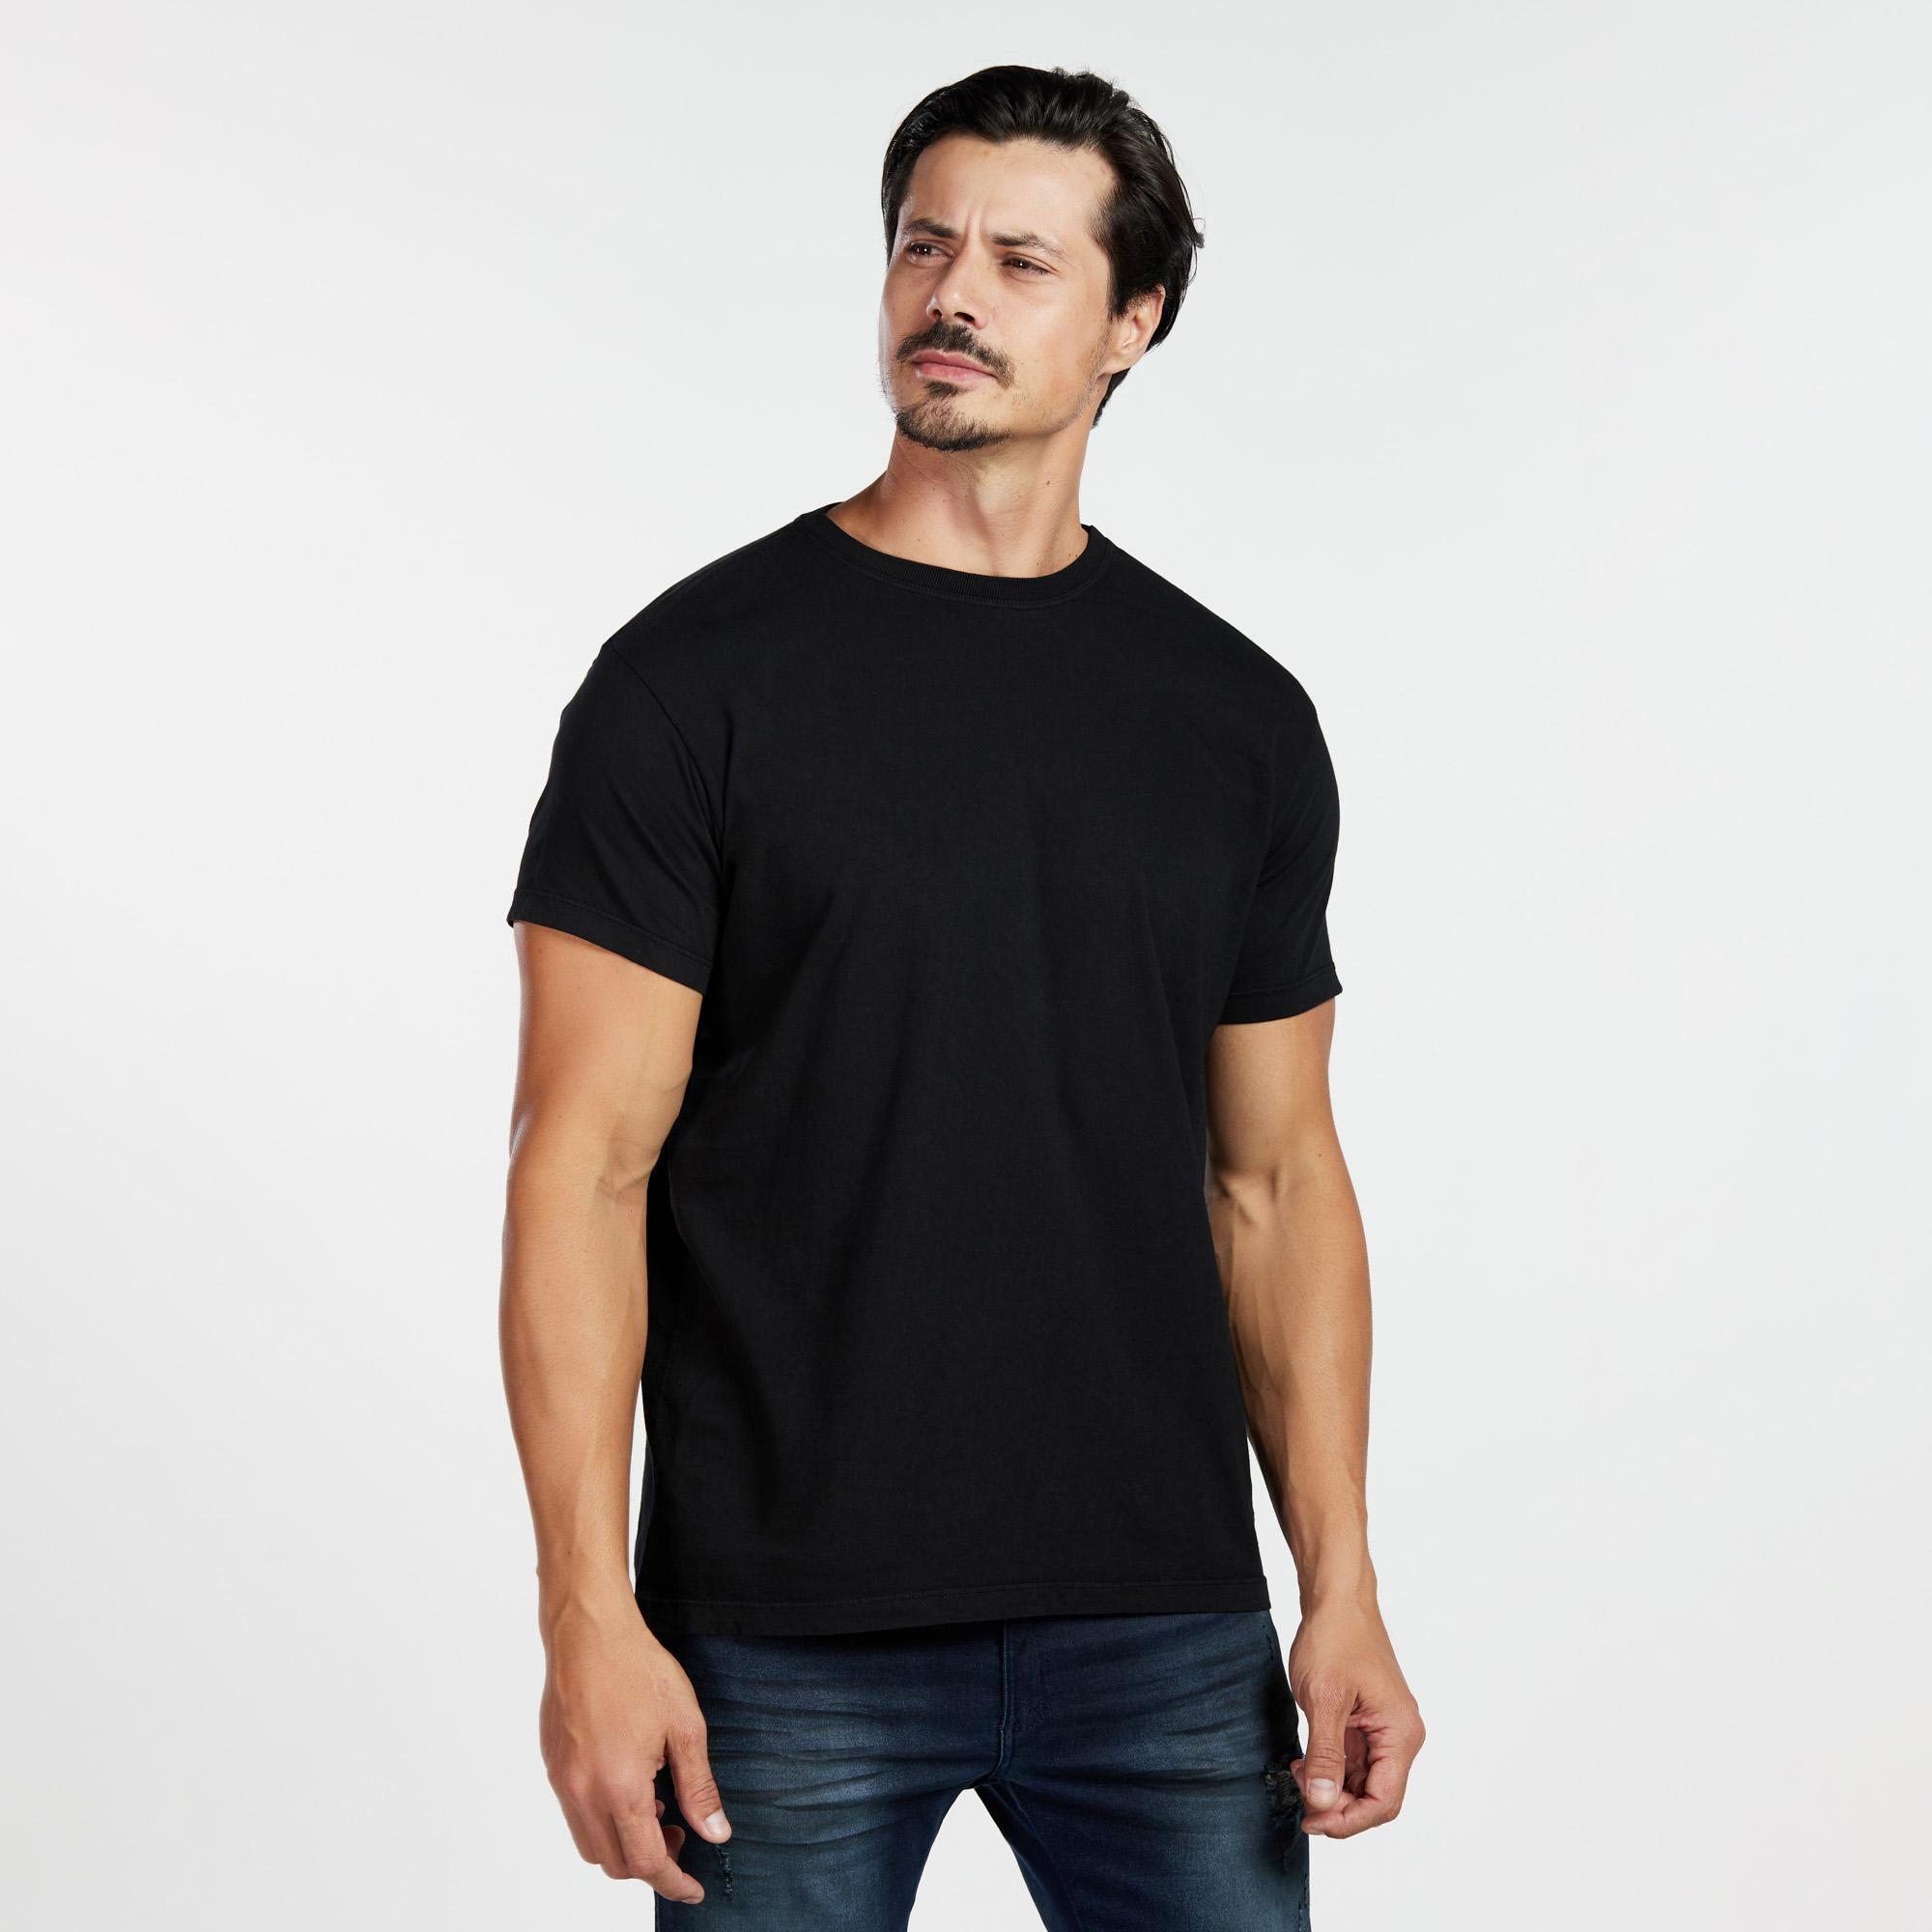 Camiseta Masculina Reativo Preta